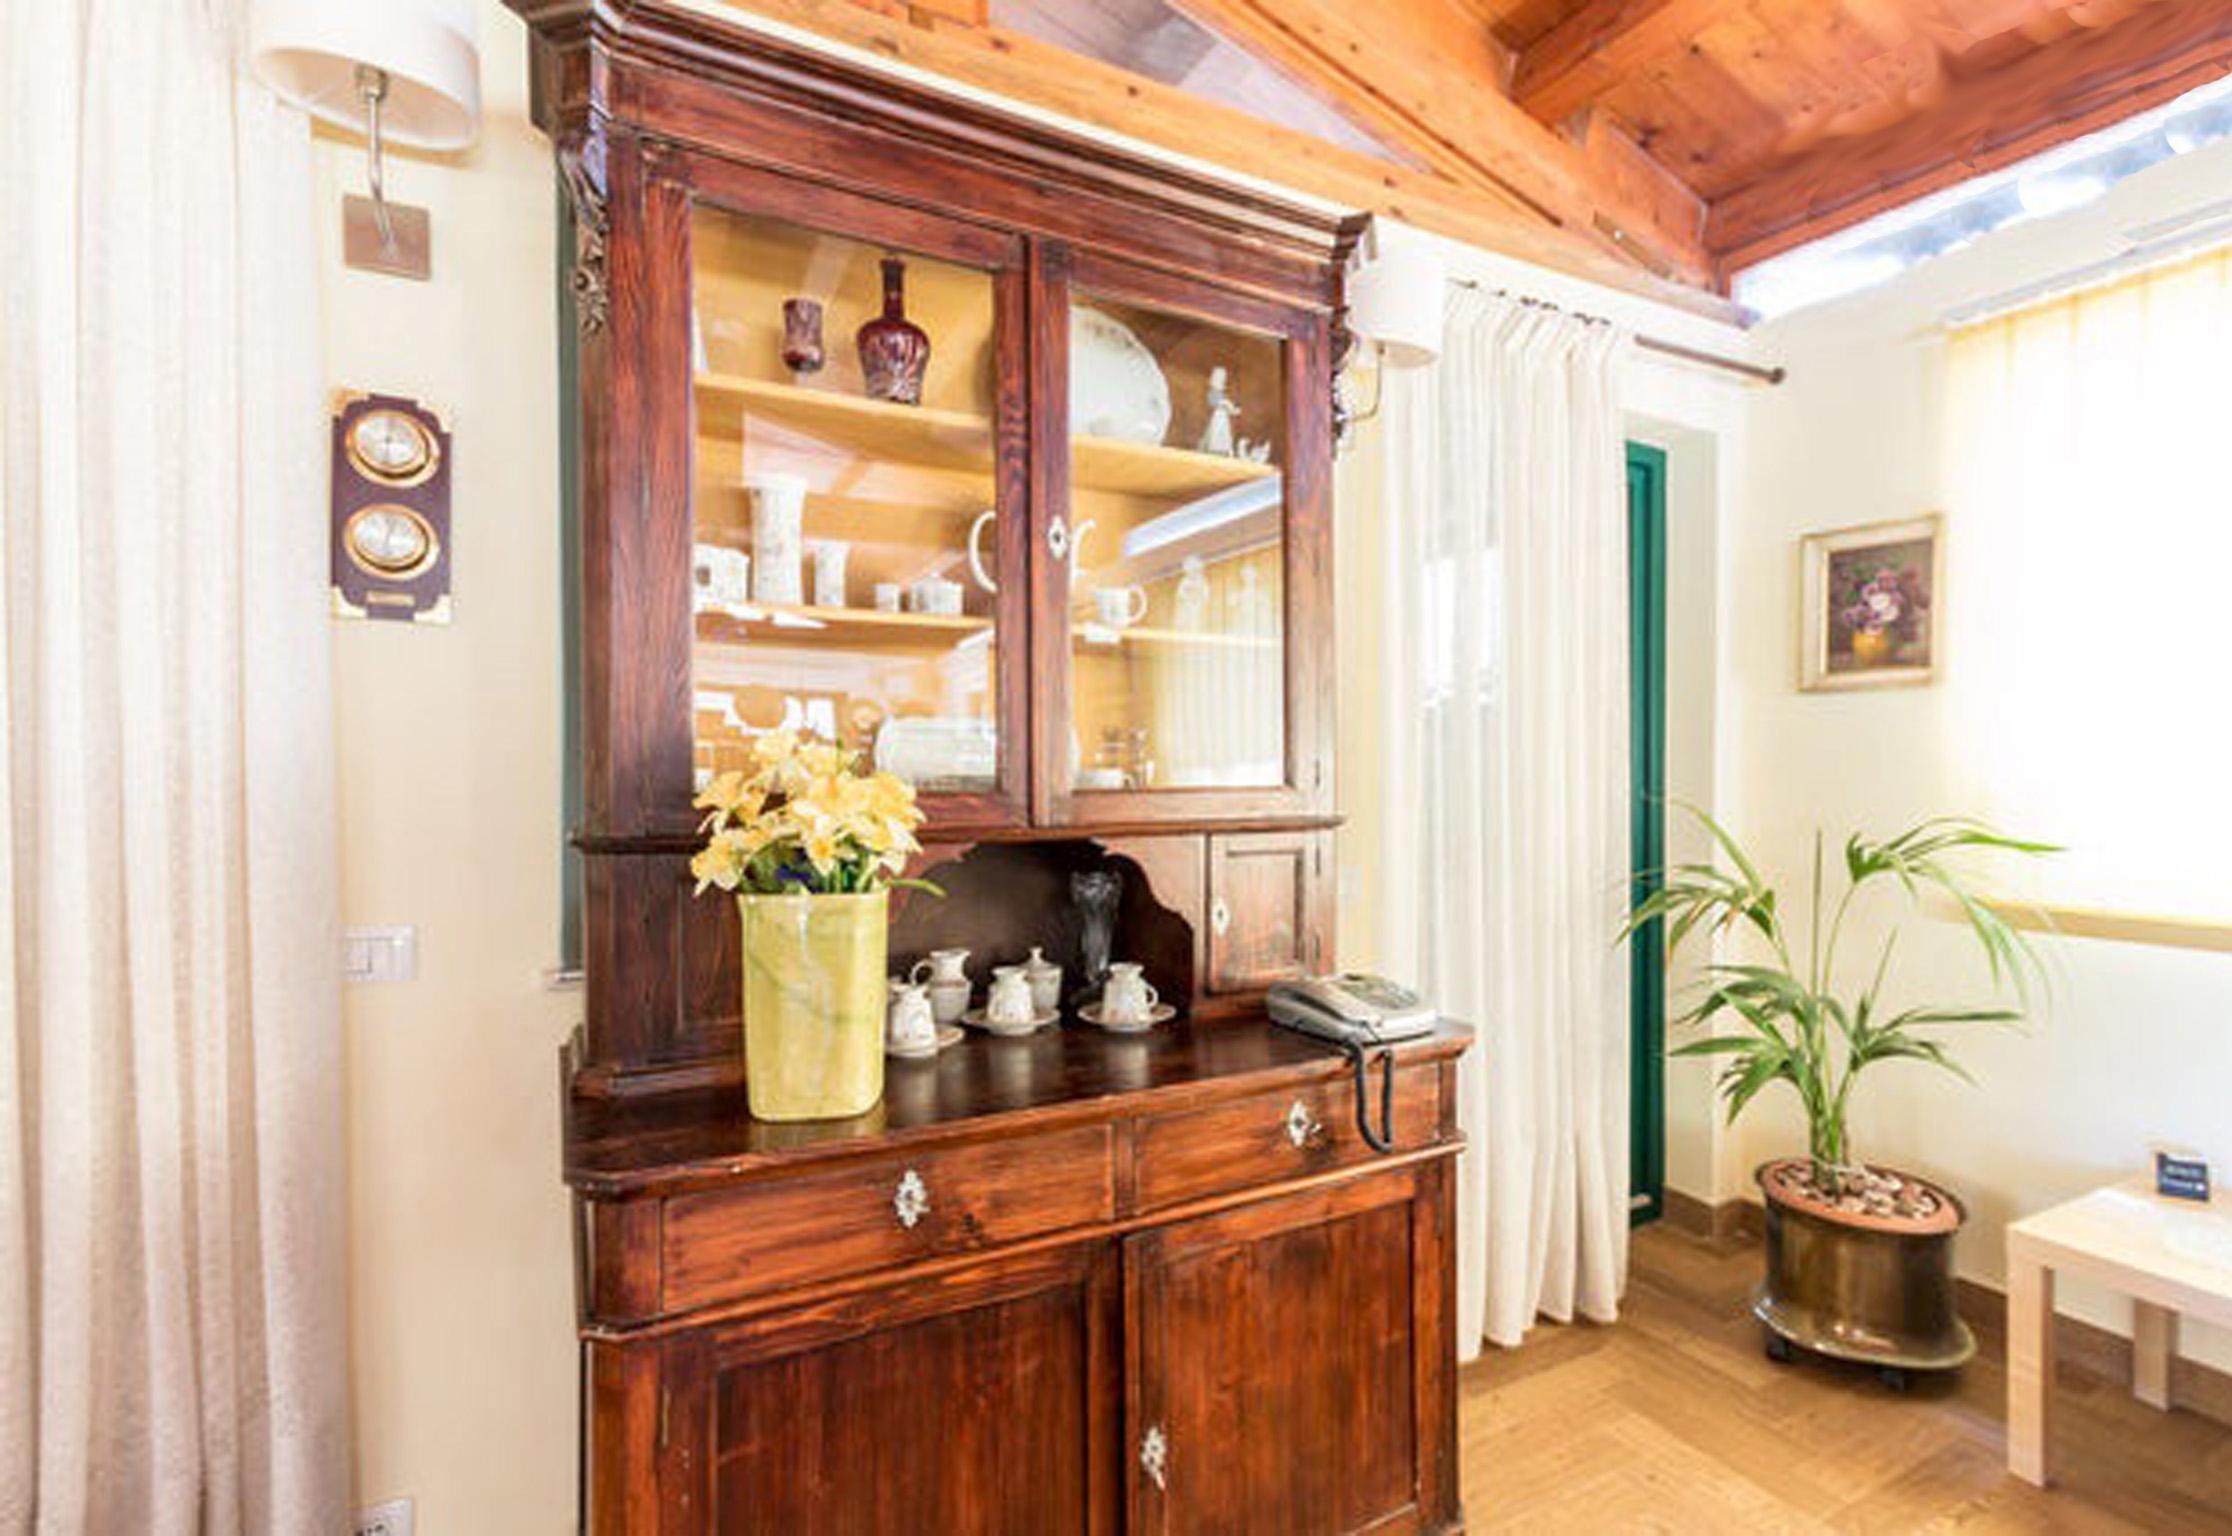 Appartement de vacances Bellavista (1730194), Modica, Ragusa, Sicile, Italie, image 5